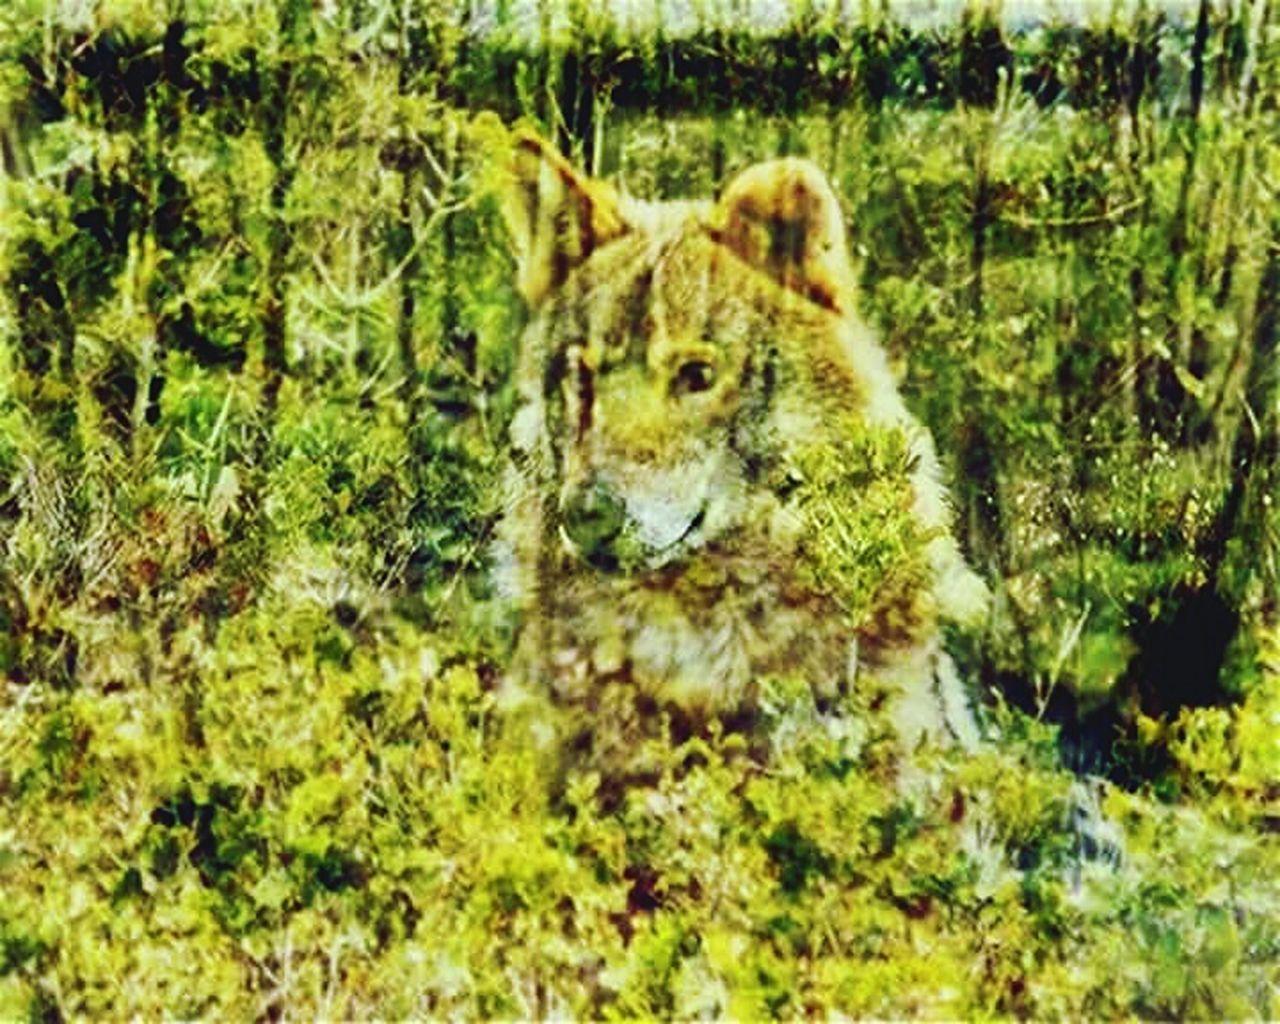 one animal, animals in the wild, animal themes, no people, day, animal wildlife, lion - feline, nature, mammal, safari animals, feline, lioness, outdoors, grass, leopard, close-up, cheetah